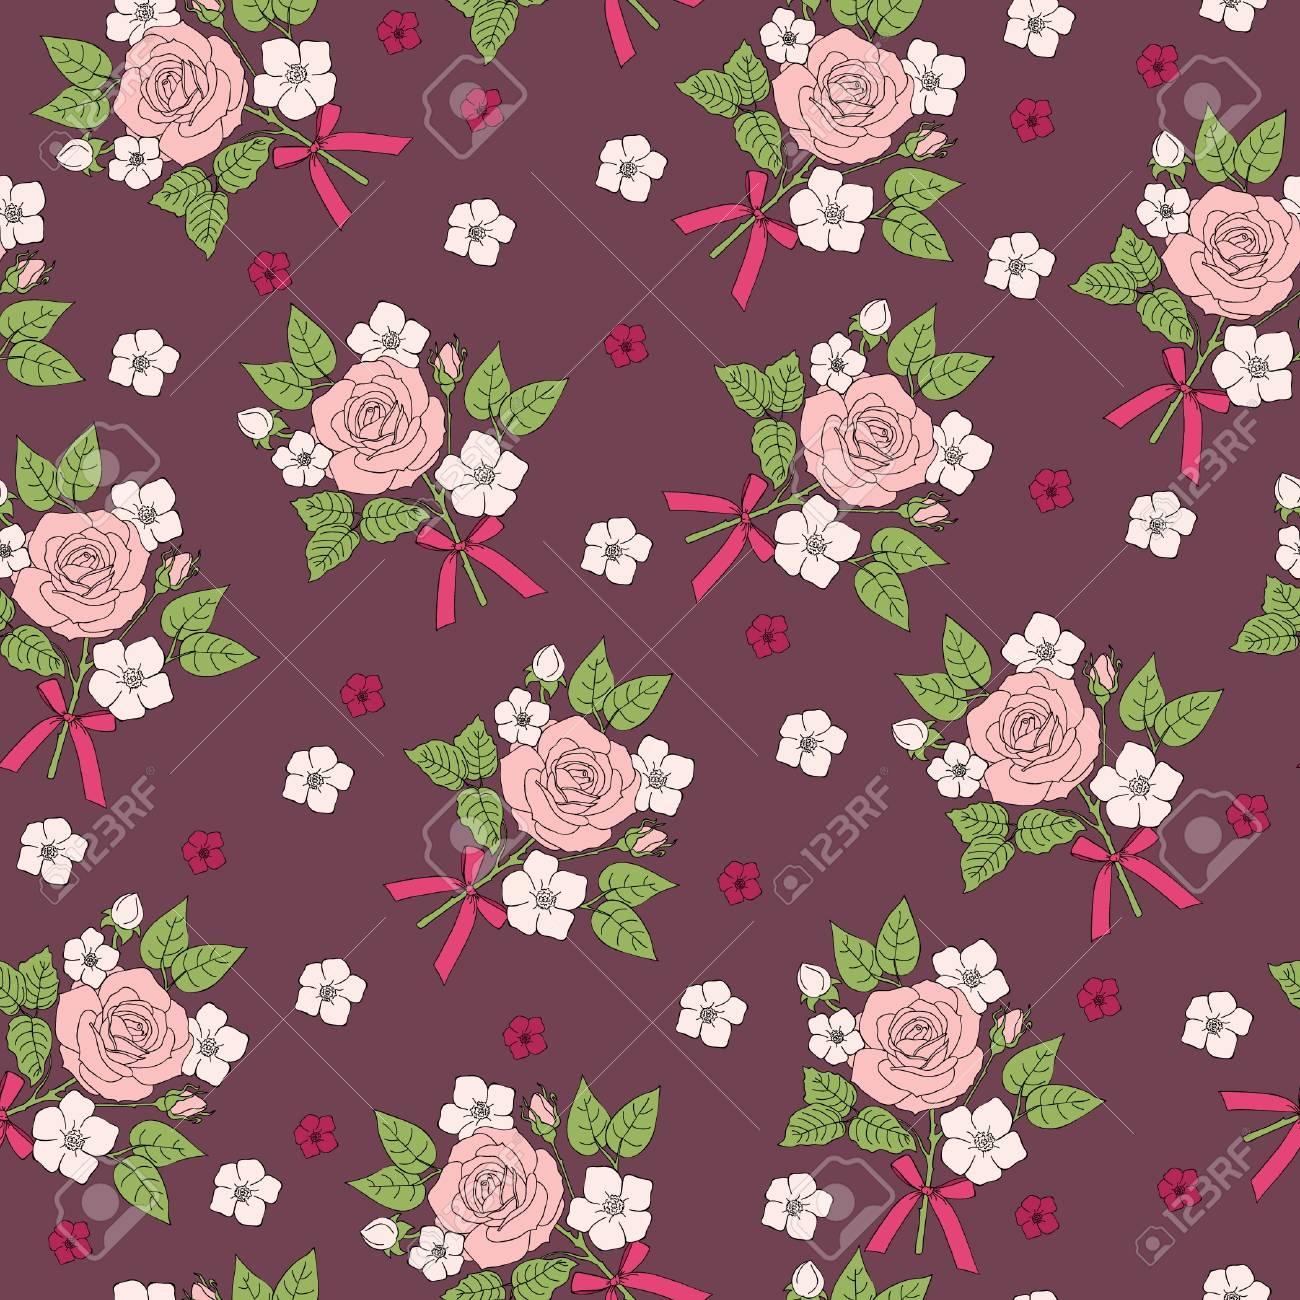 Seamless Retro Floral Design Wallpaper Pattern Royalty Free